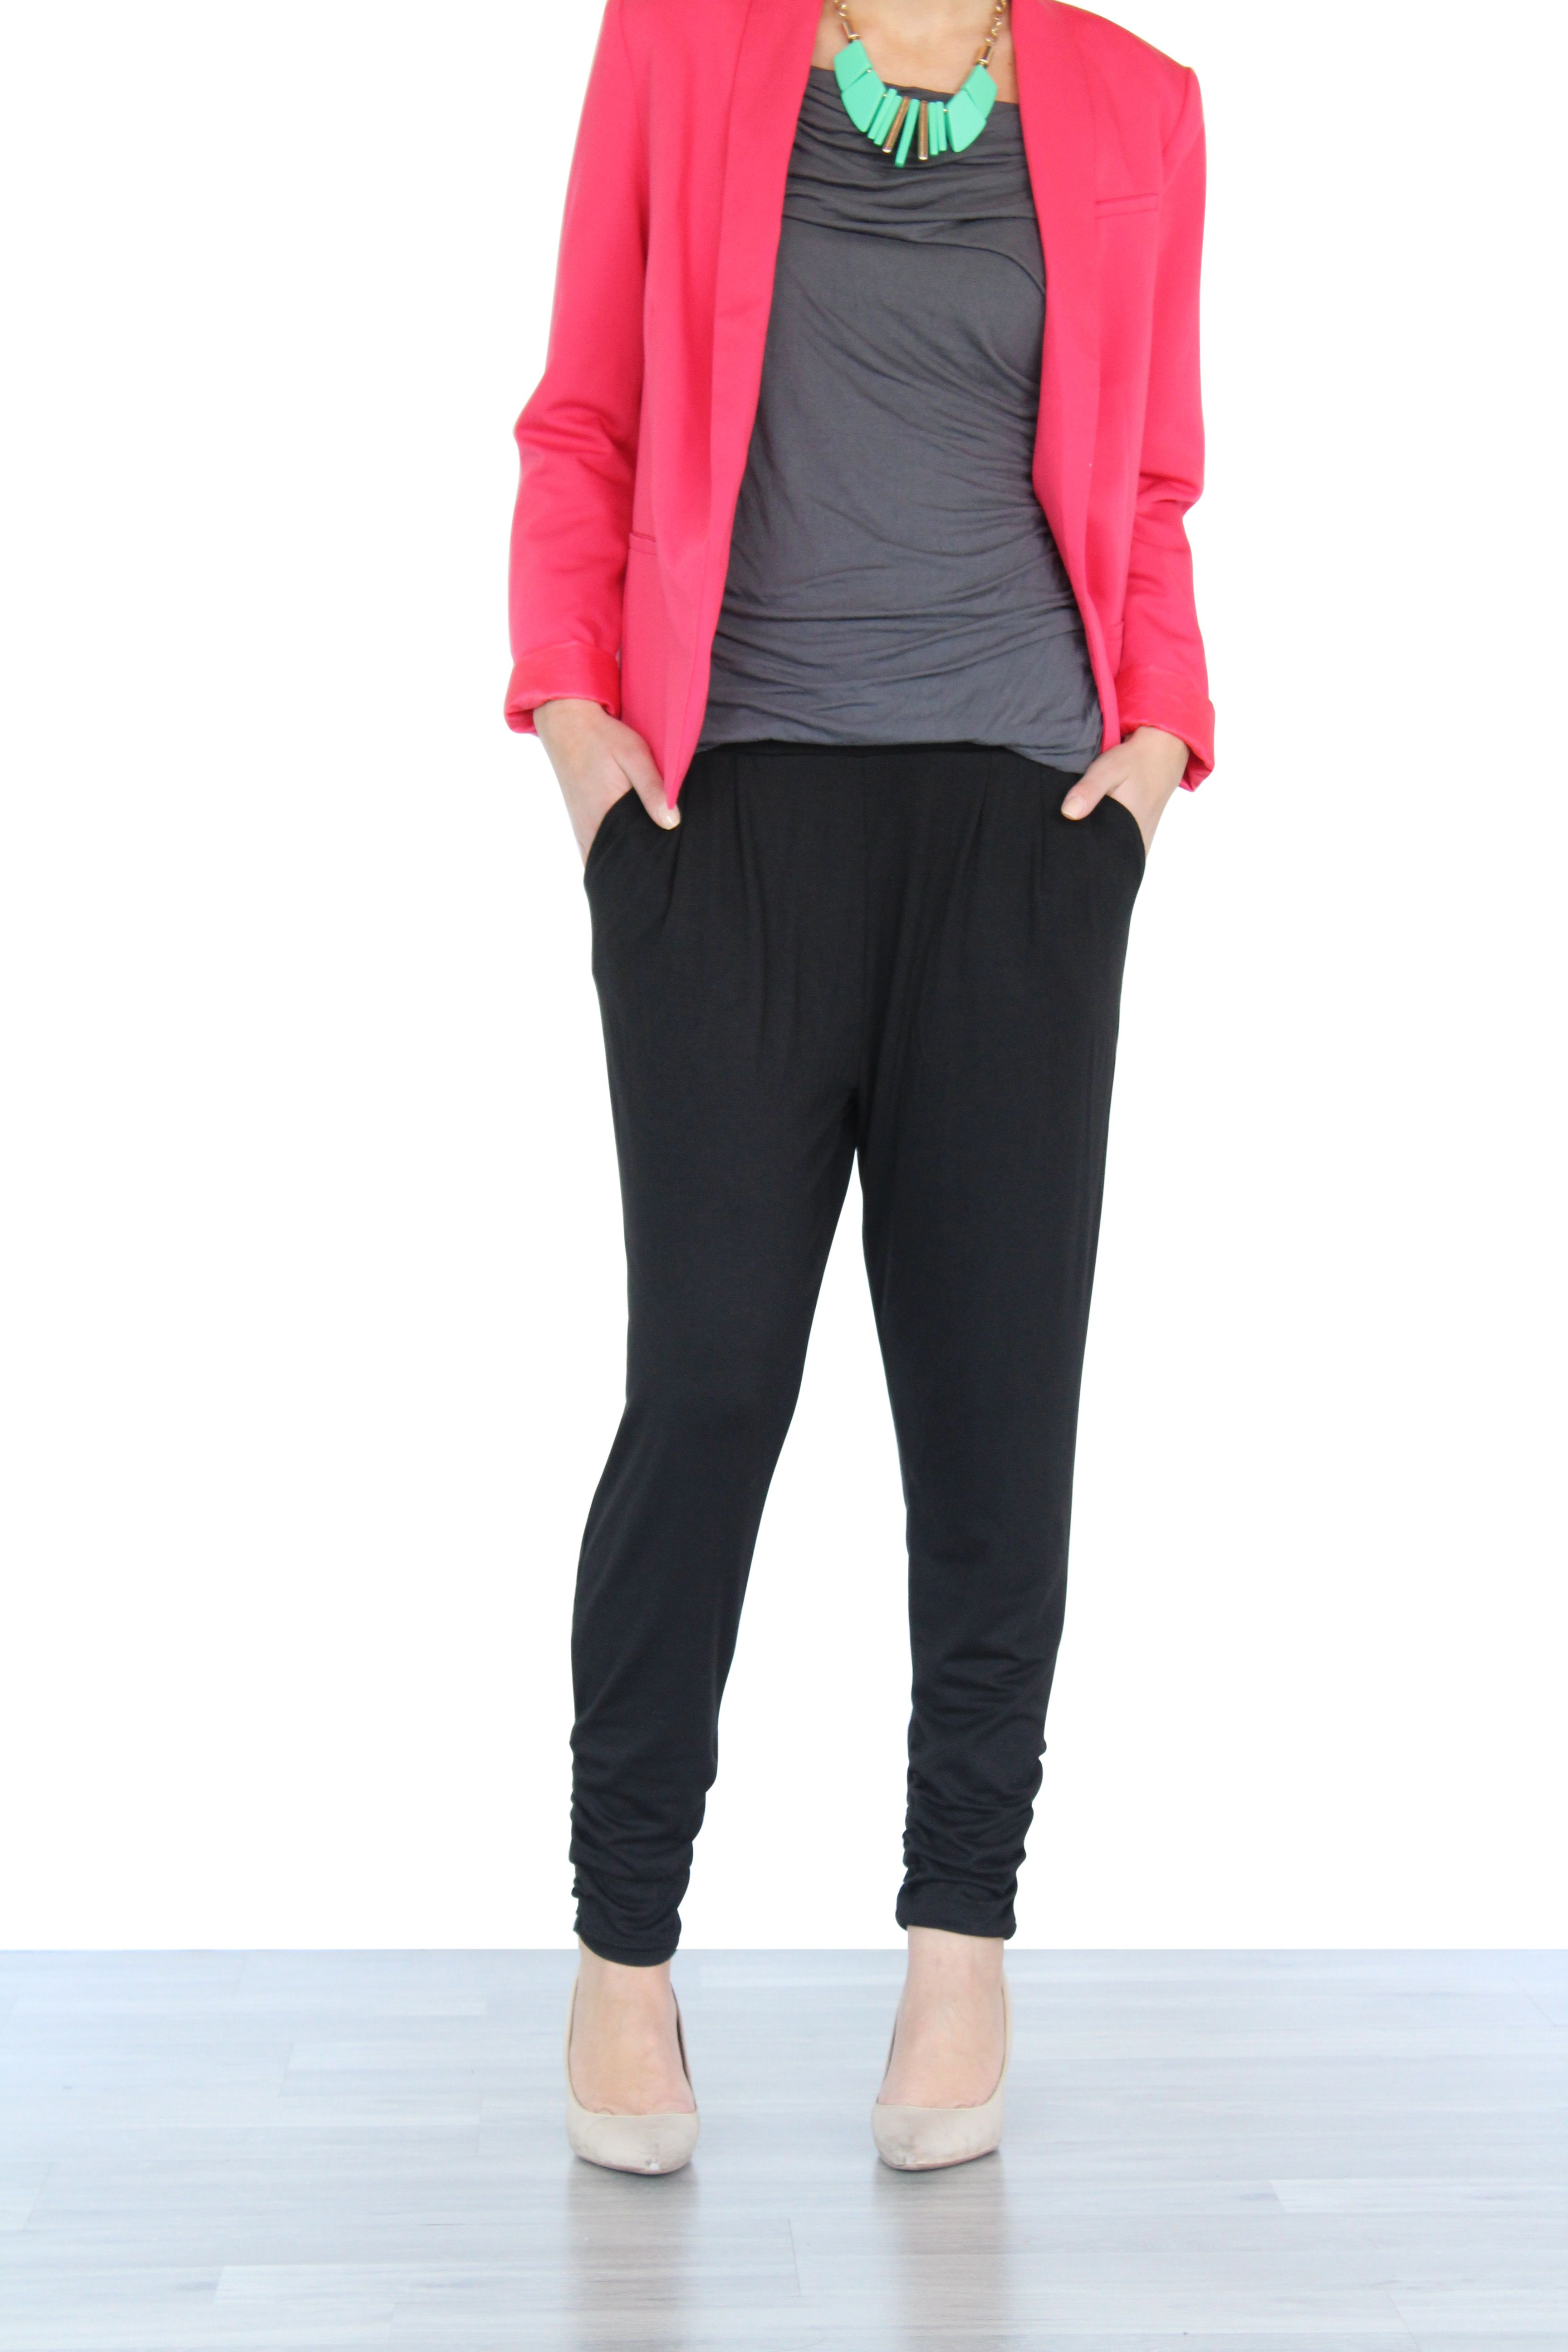 how to wear dressy joggers dressy sweatpants to work. dress up ...